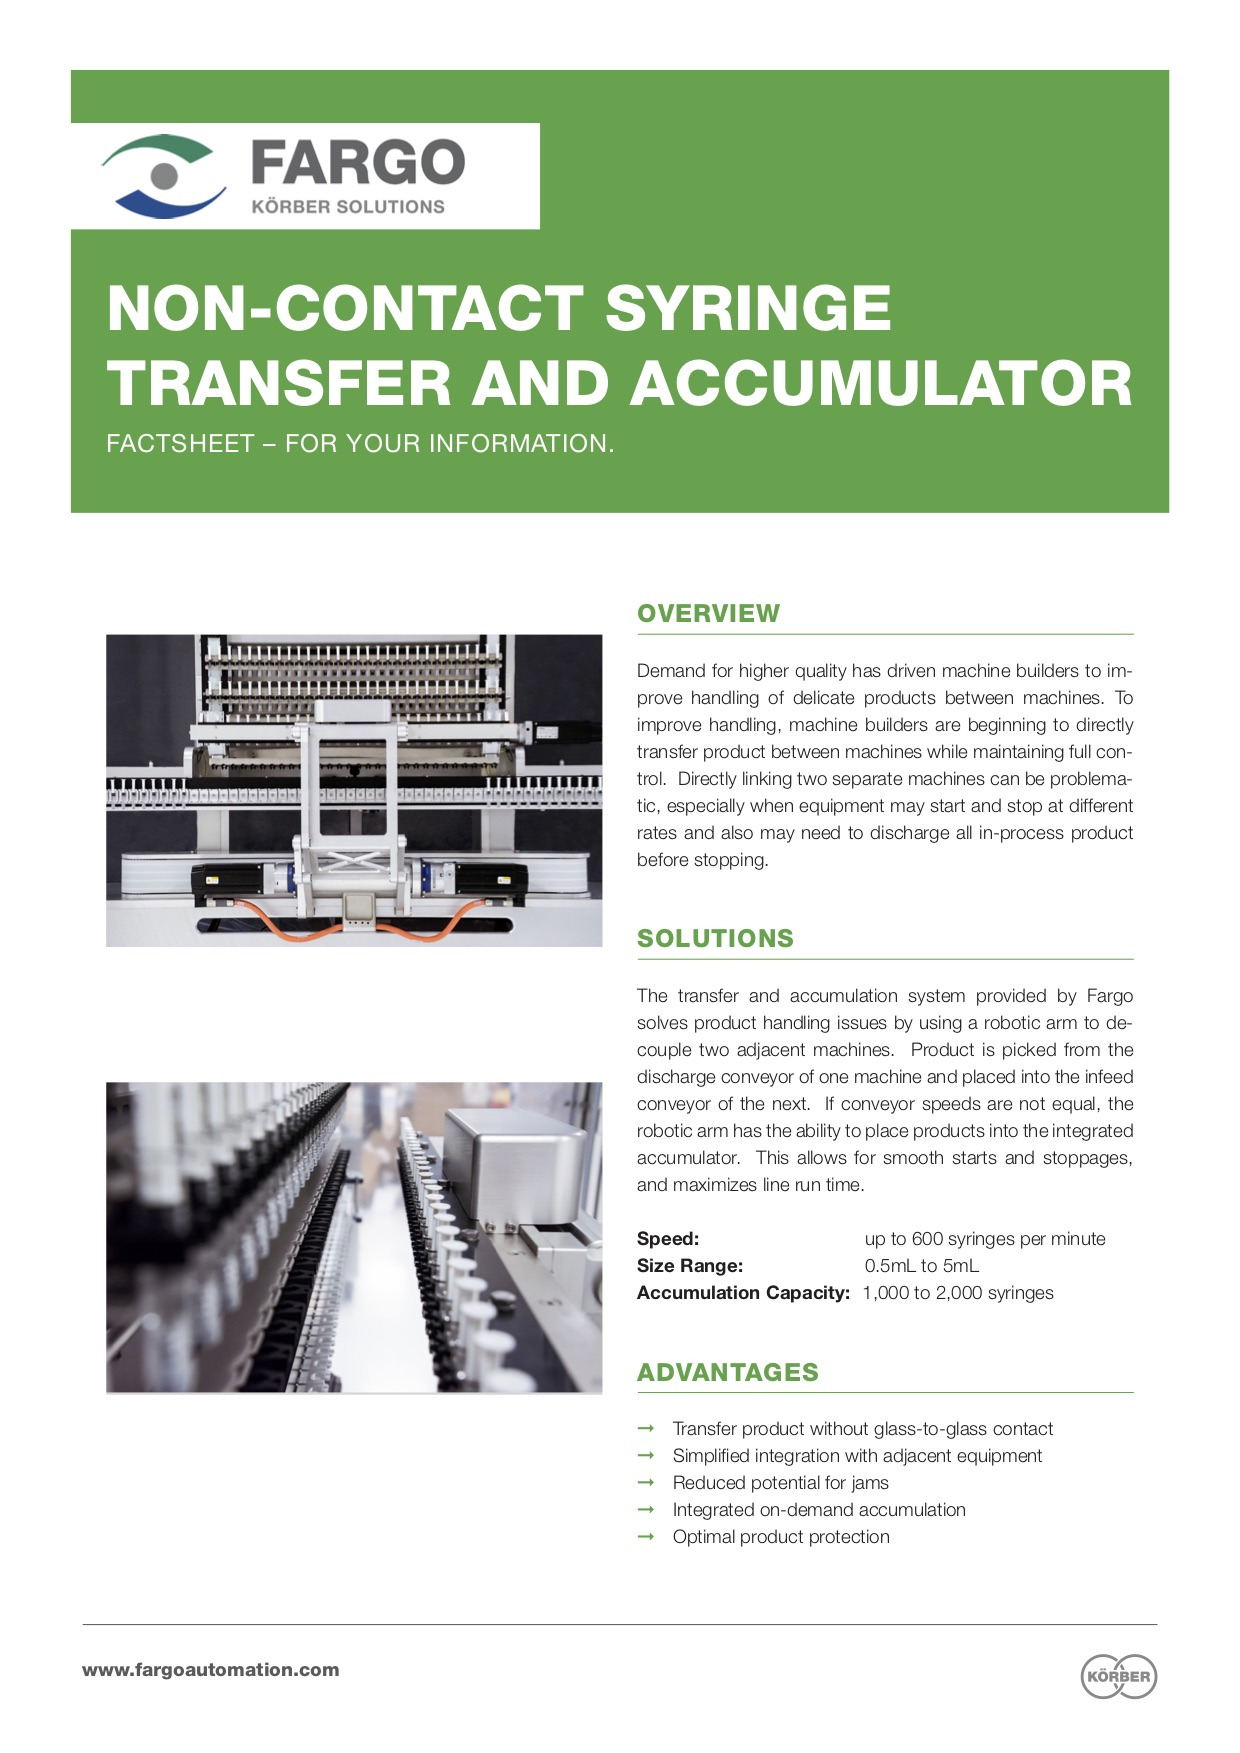 Fargo-Automation_Syringe-Accumulator_2017-05